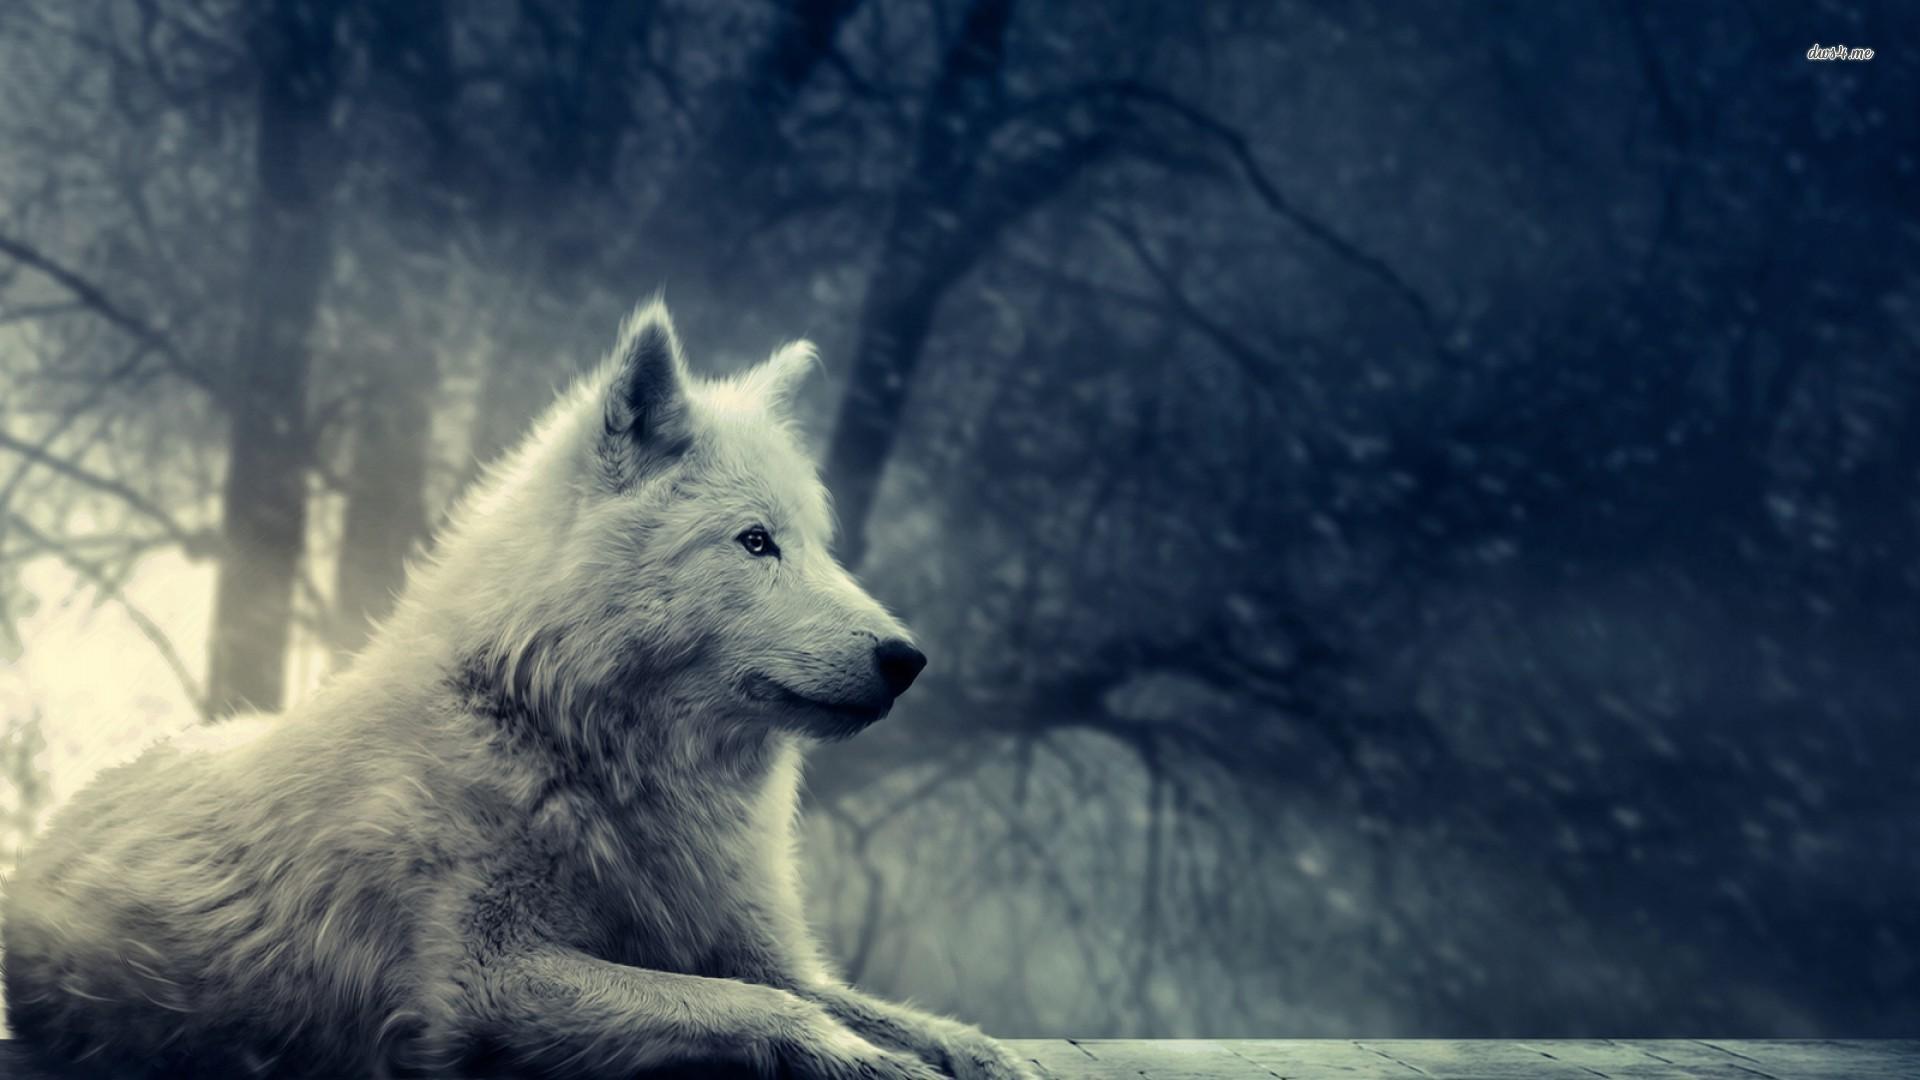 despre daci 9864 grey wolf 19201080 digital art wallpaper 1920x1080